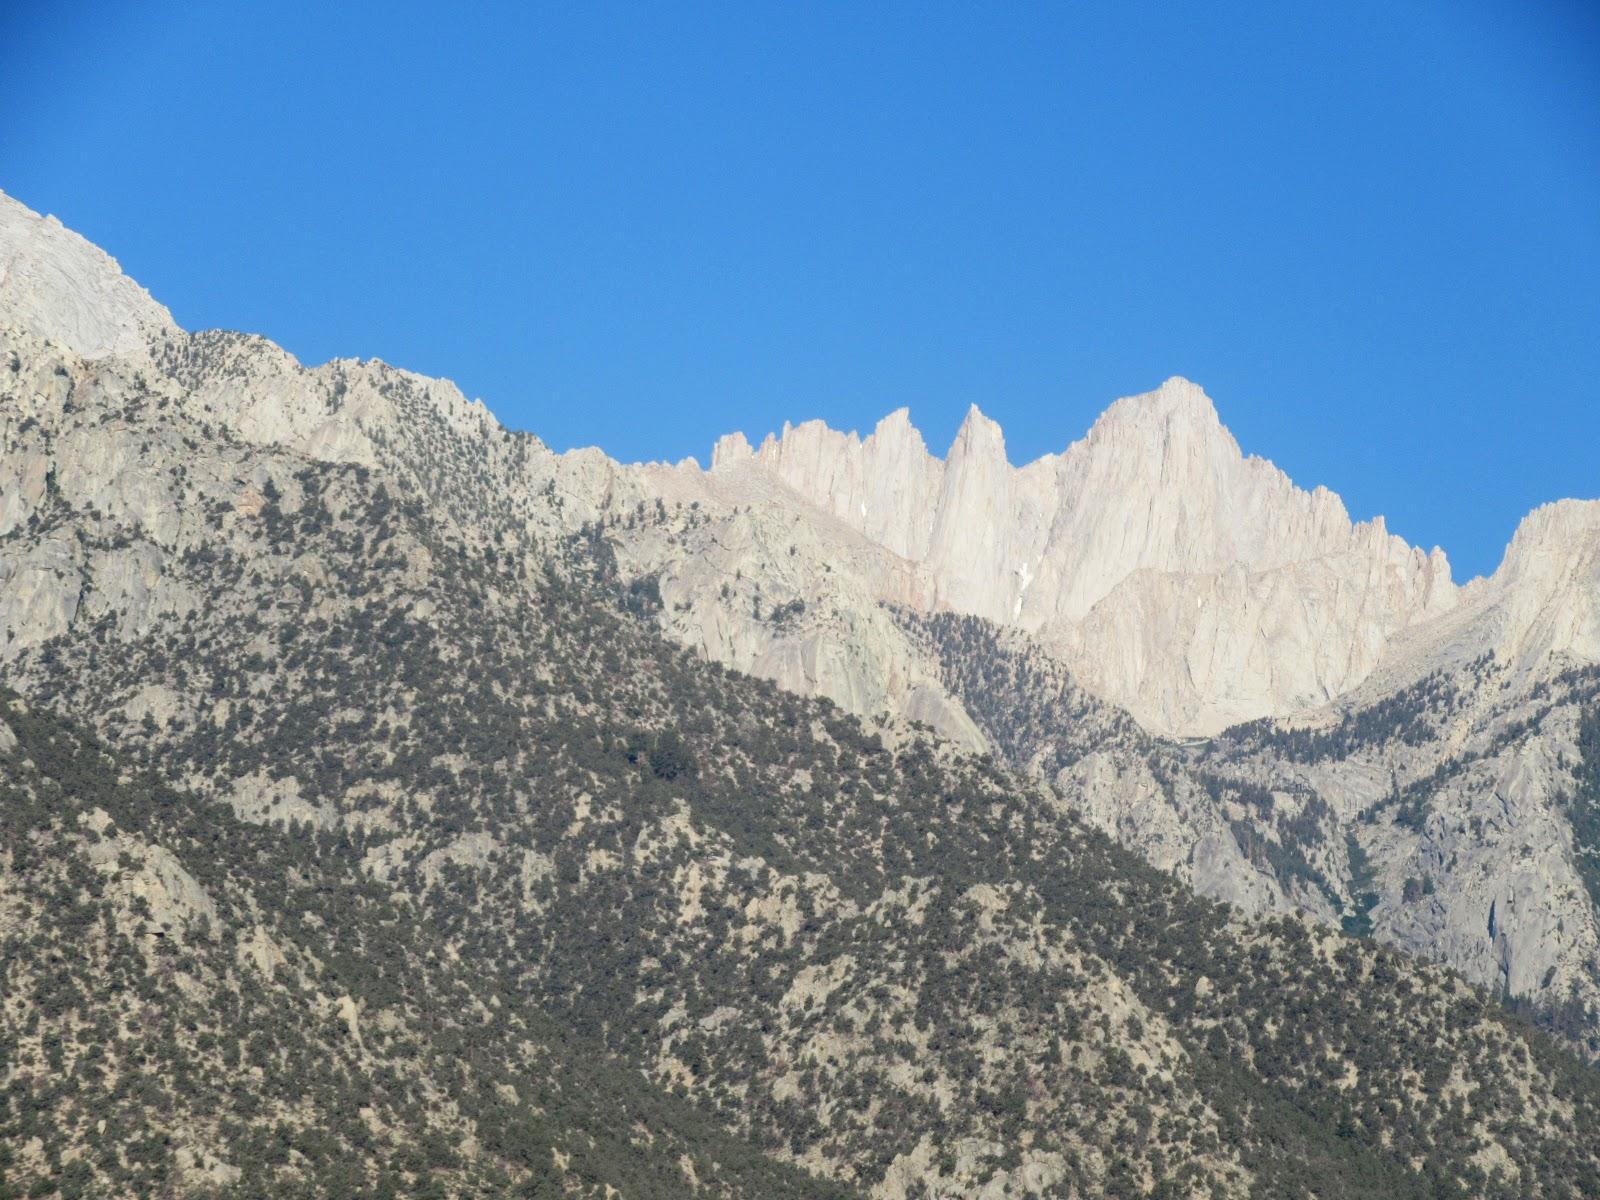 spires of mt whitney summit